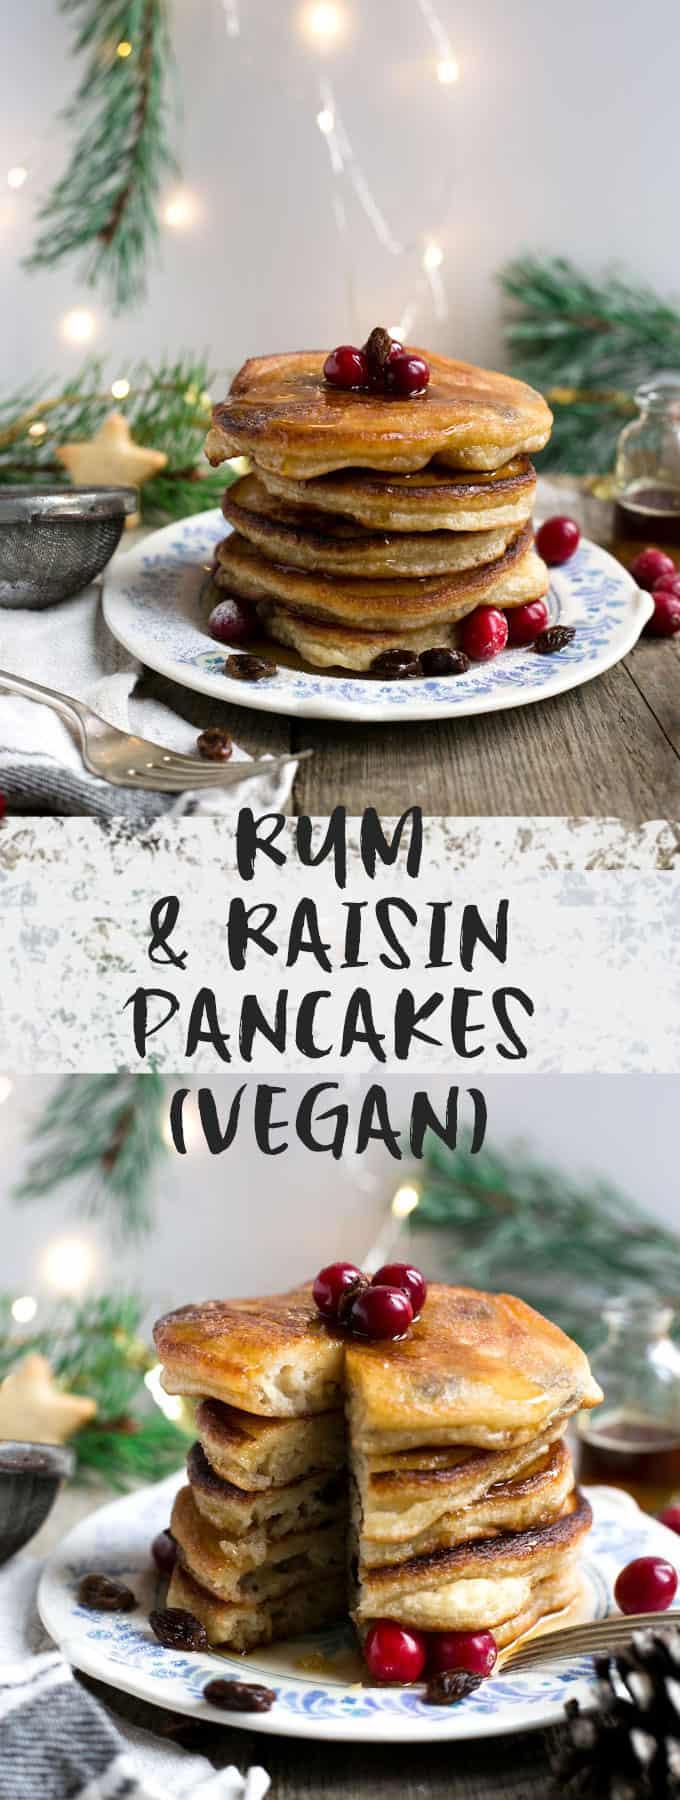 Rum & raisin pancakes, soft, fluffy and festive treat for Christmas morning! #vegan #pancakes #christmas | via @annabanana.co